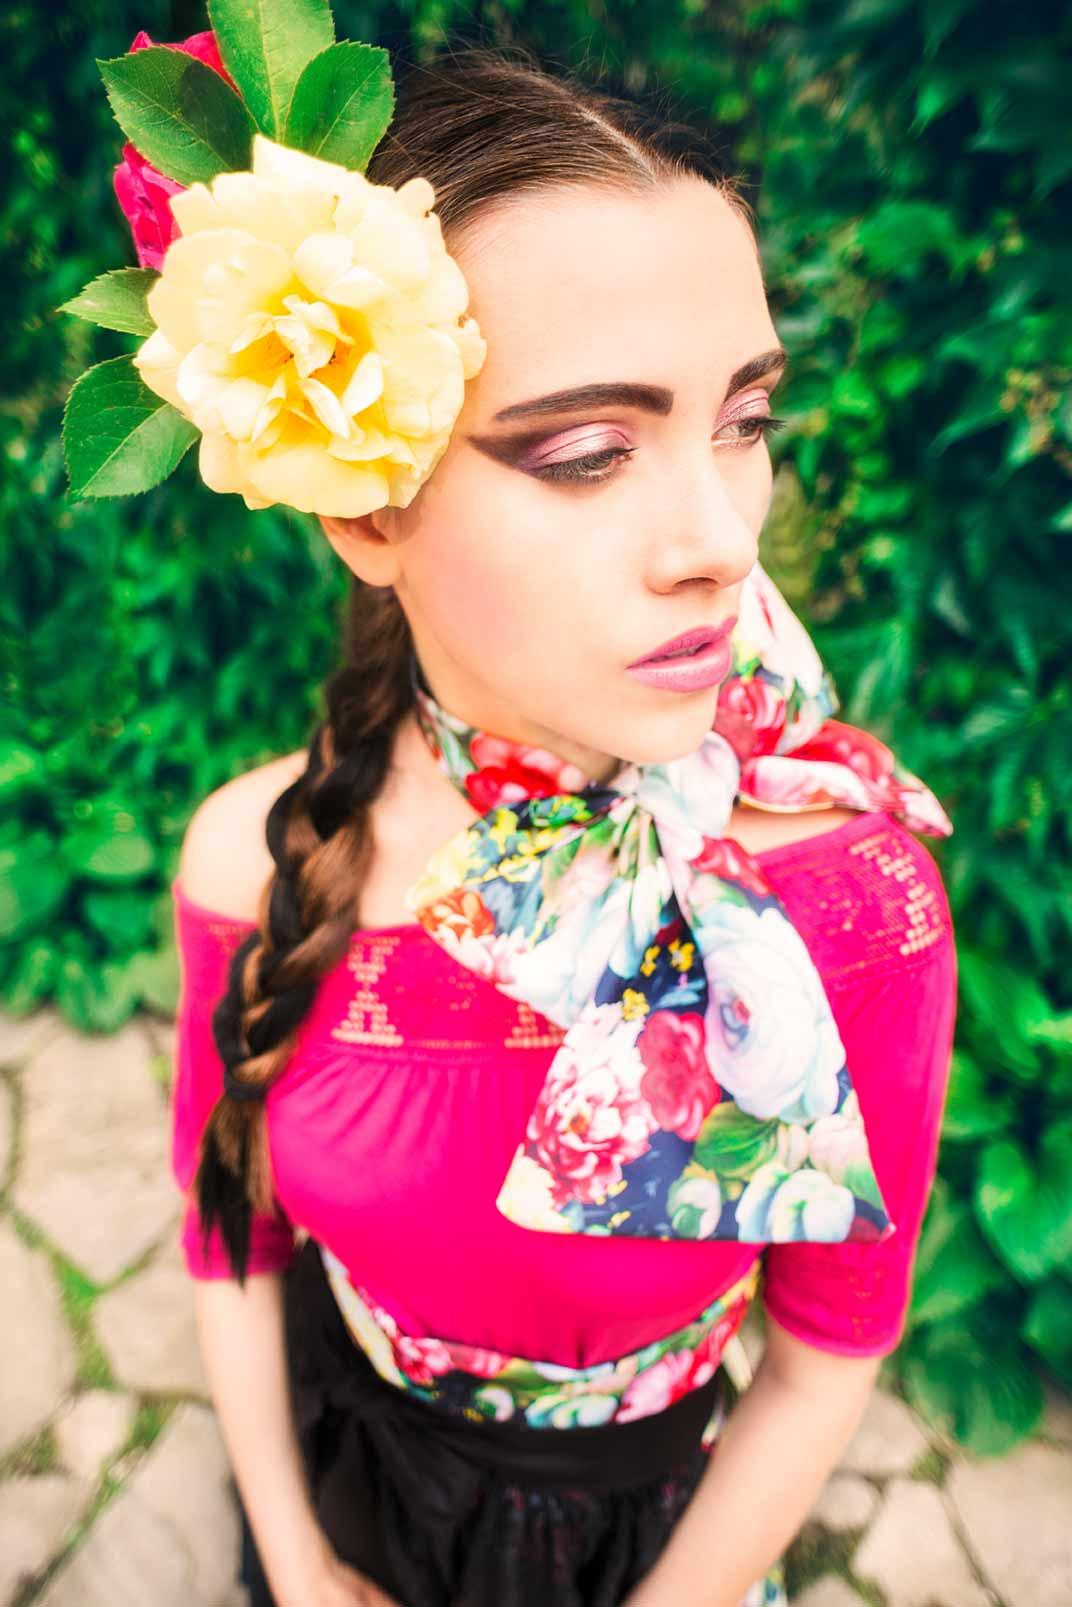 CB_Ga¦ênsebluemchen_Gruenschnabel_Frida_Kahlo_002